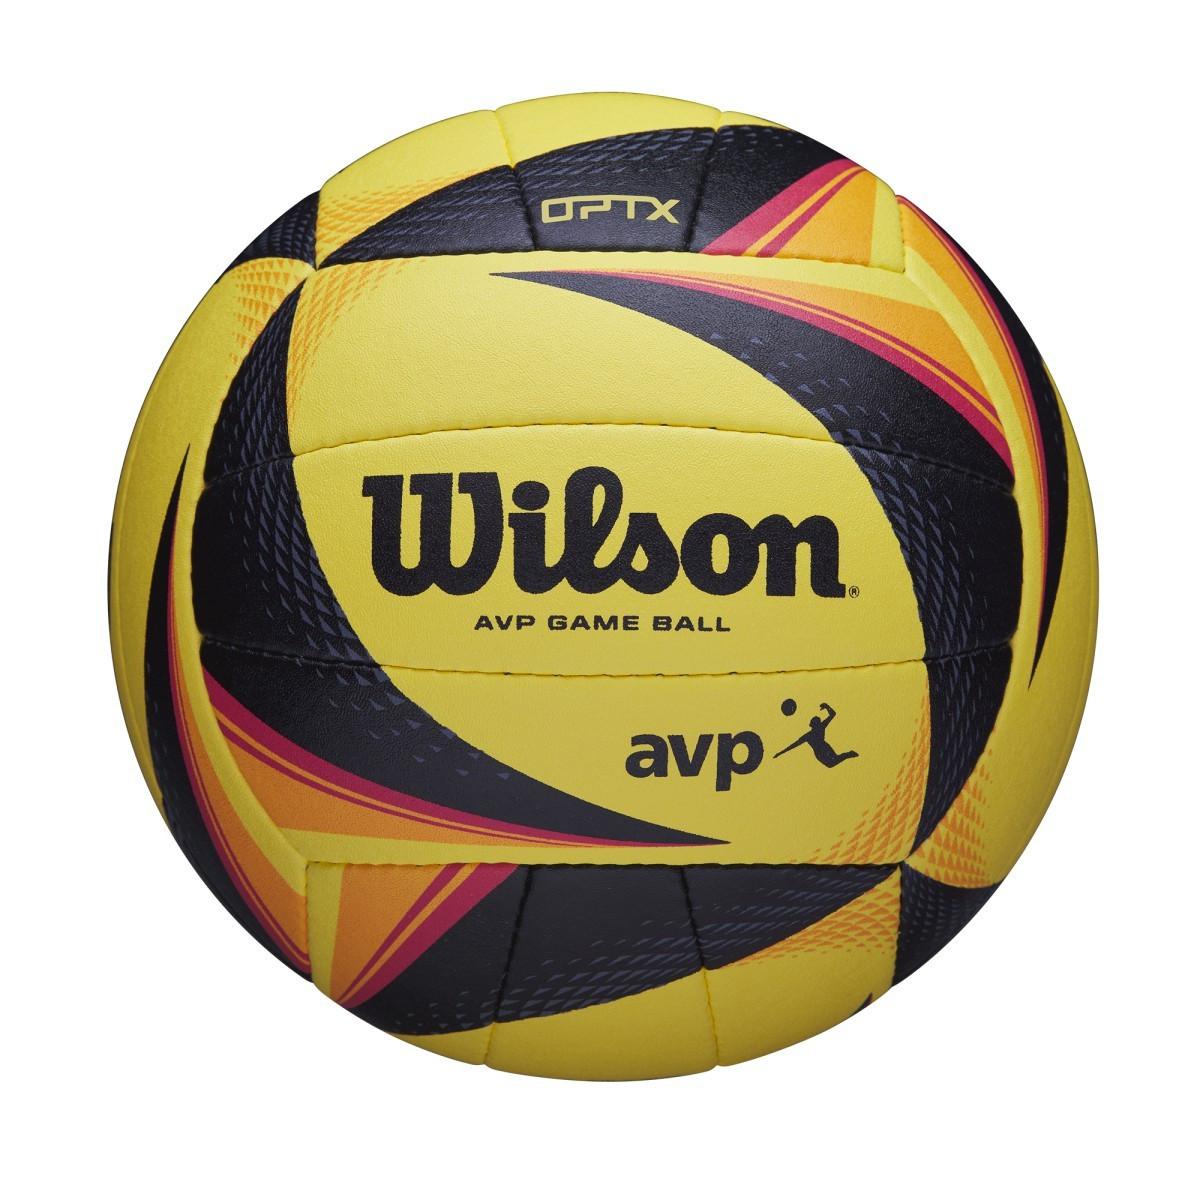 Wilson Optx AVP Game Volleyball